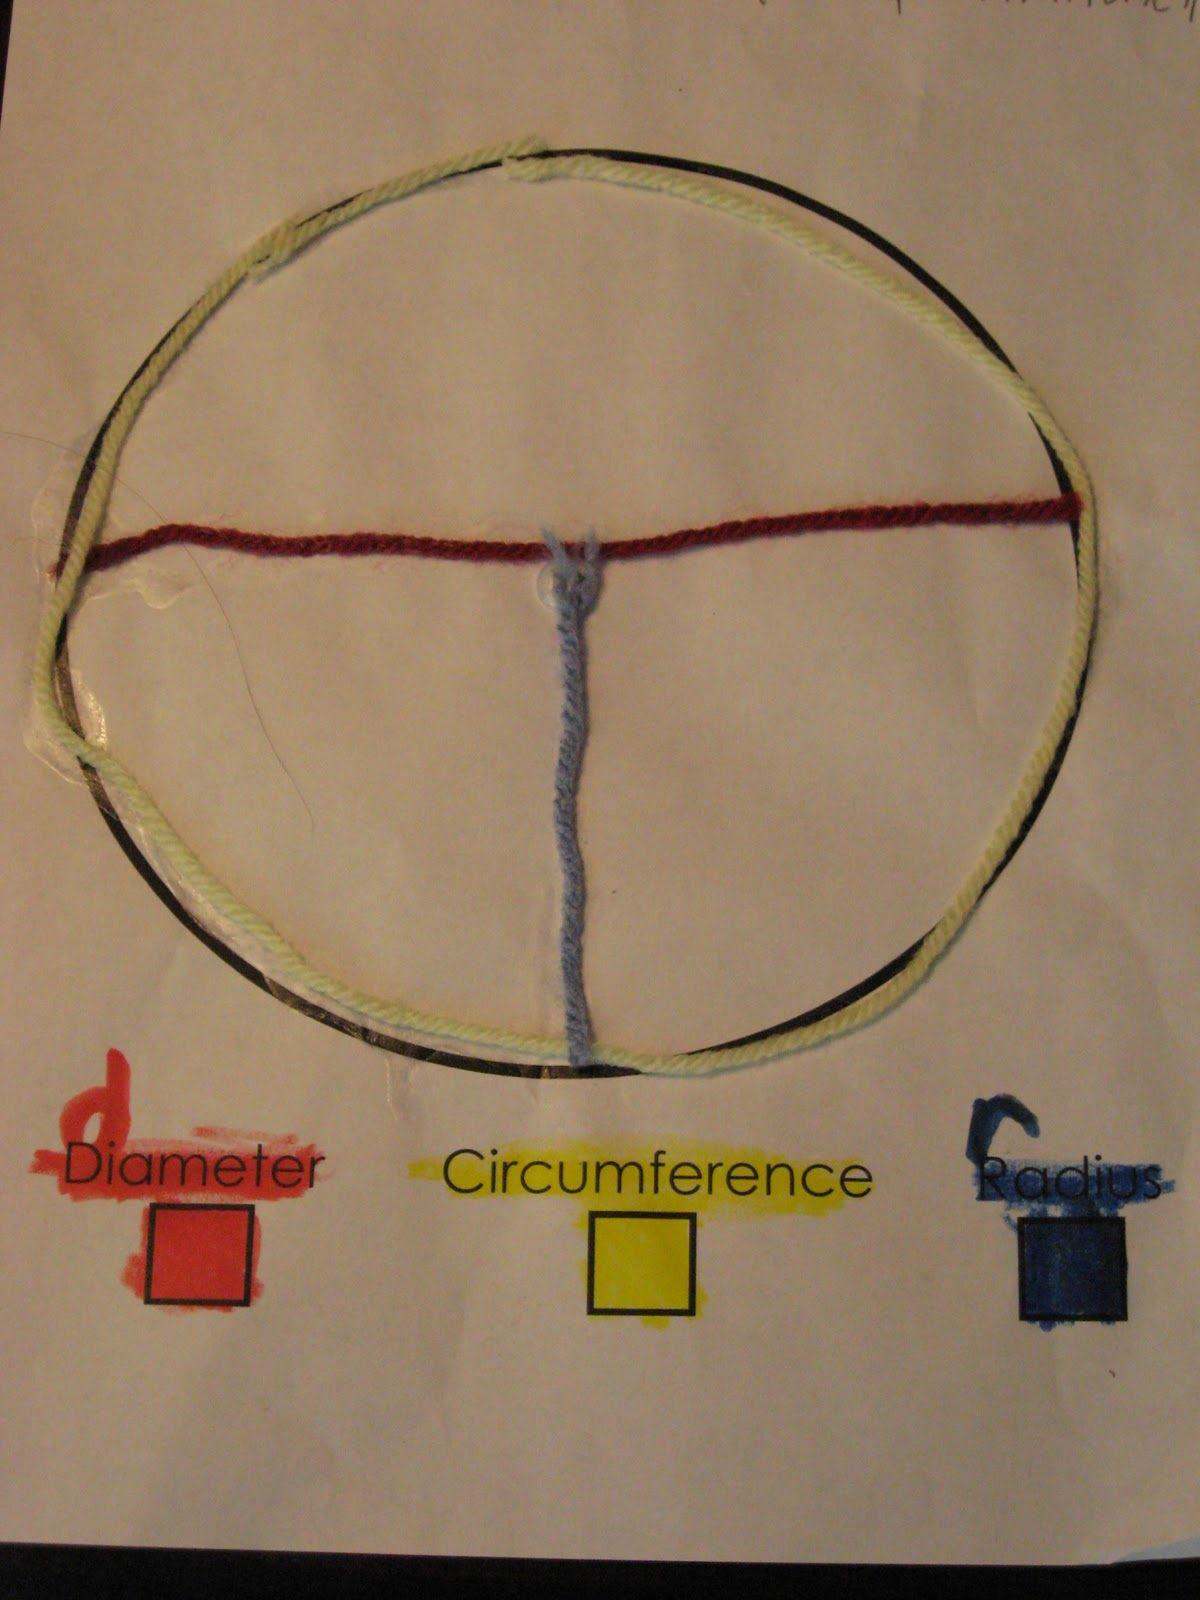 Diameter, Circumference, Radius